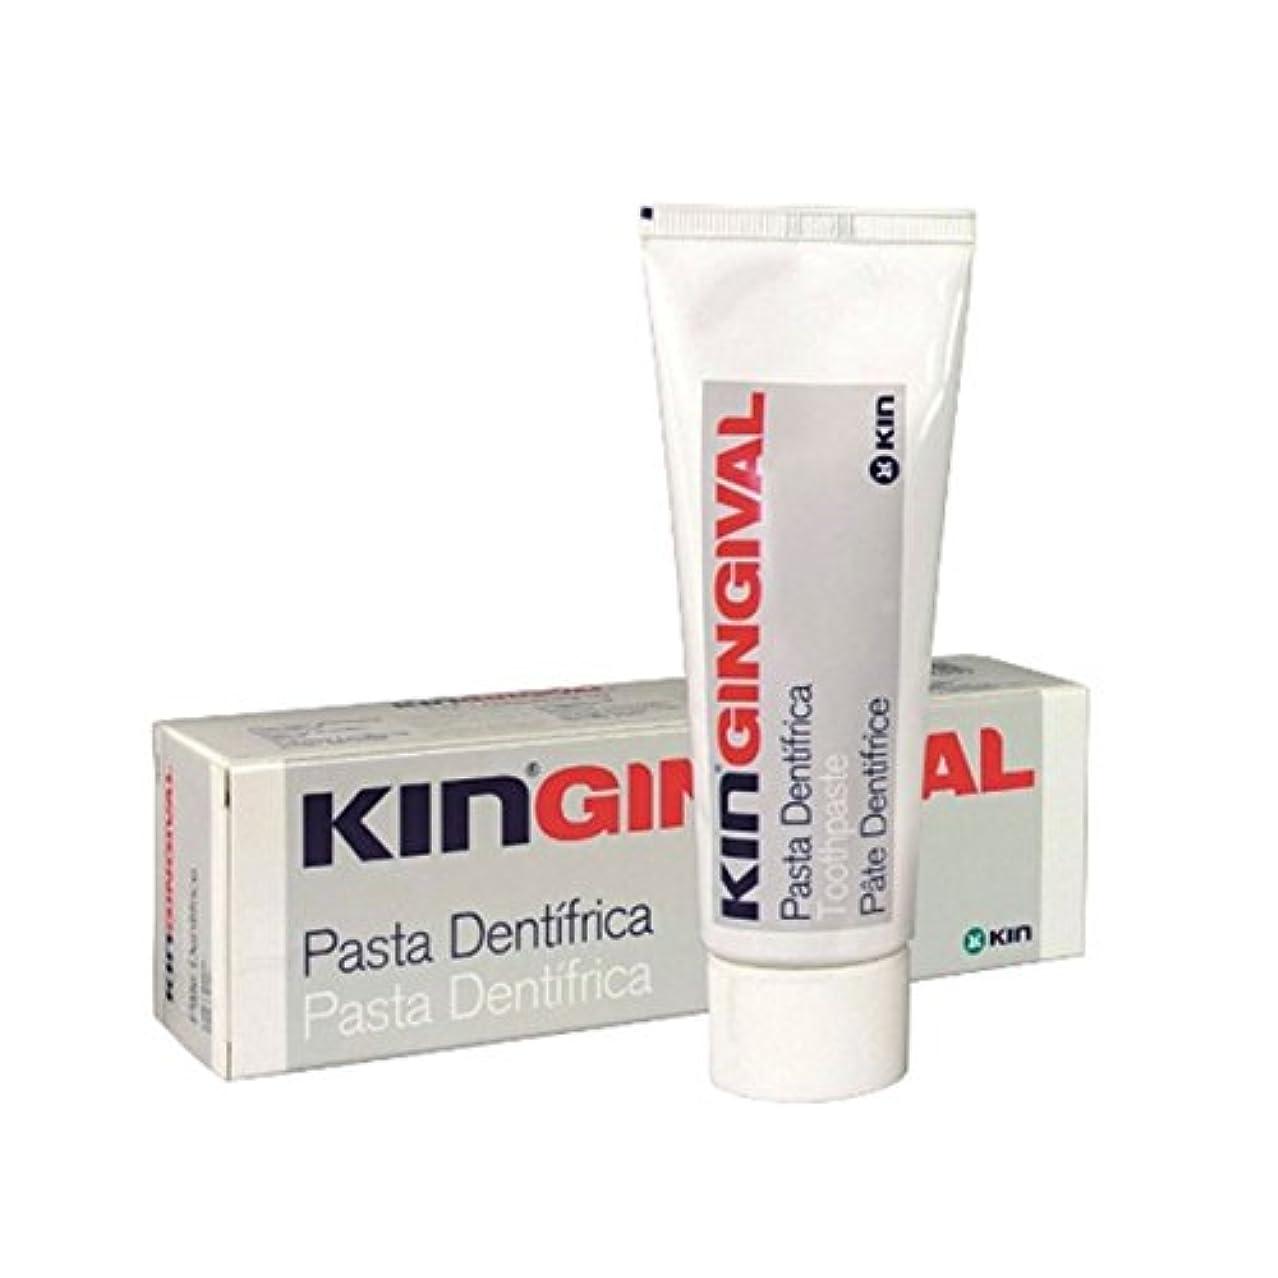 Kin Gingival Sensitive Gums Toothpaste 75ml [並行輸入品]